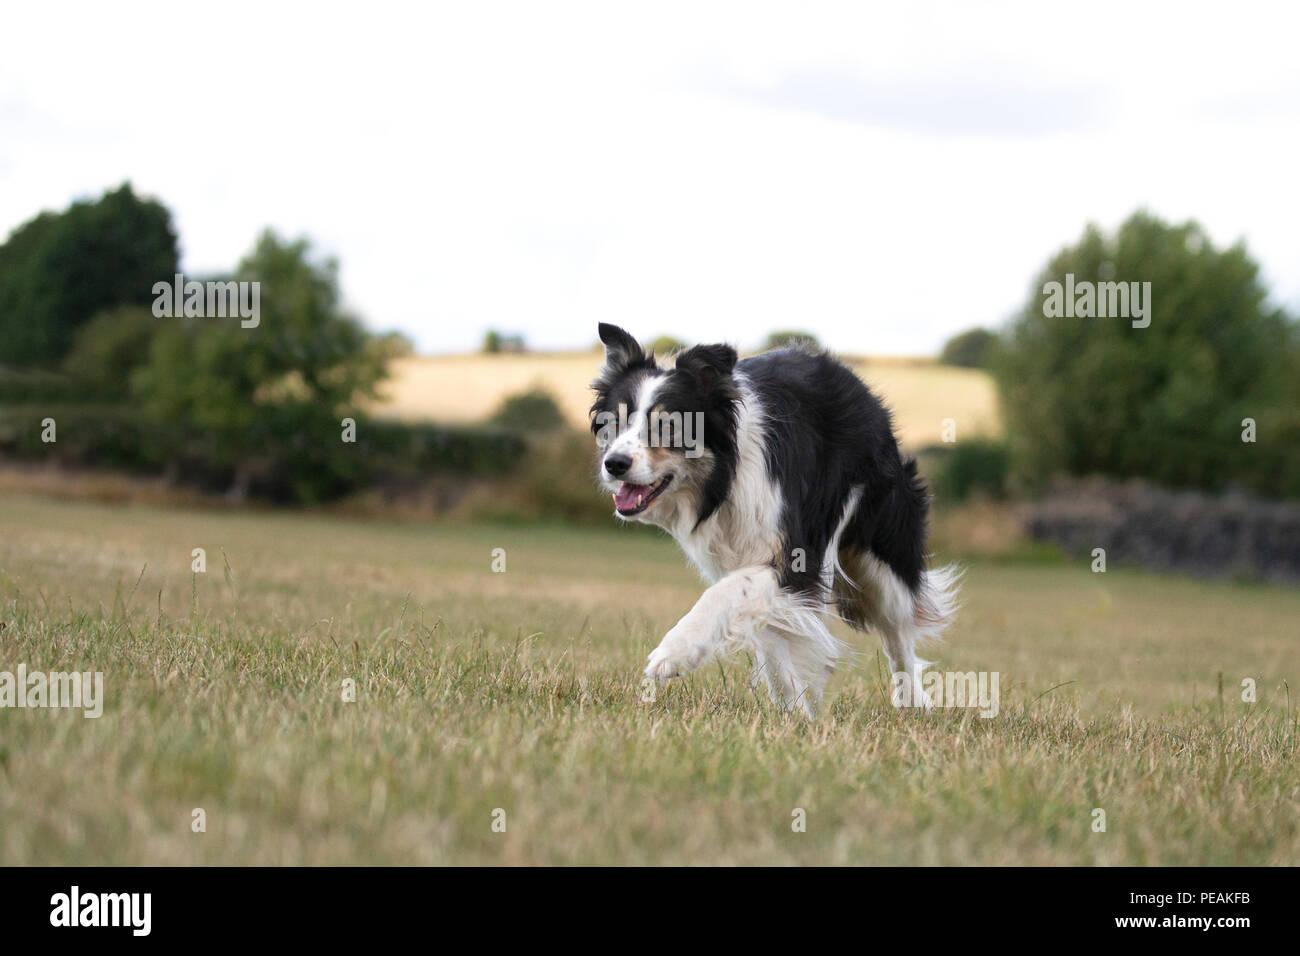 Border Collie dog Canis lupus familiaris in familiar stalking pose on dry grassy farmland - Stock Image